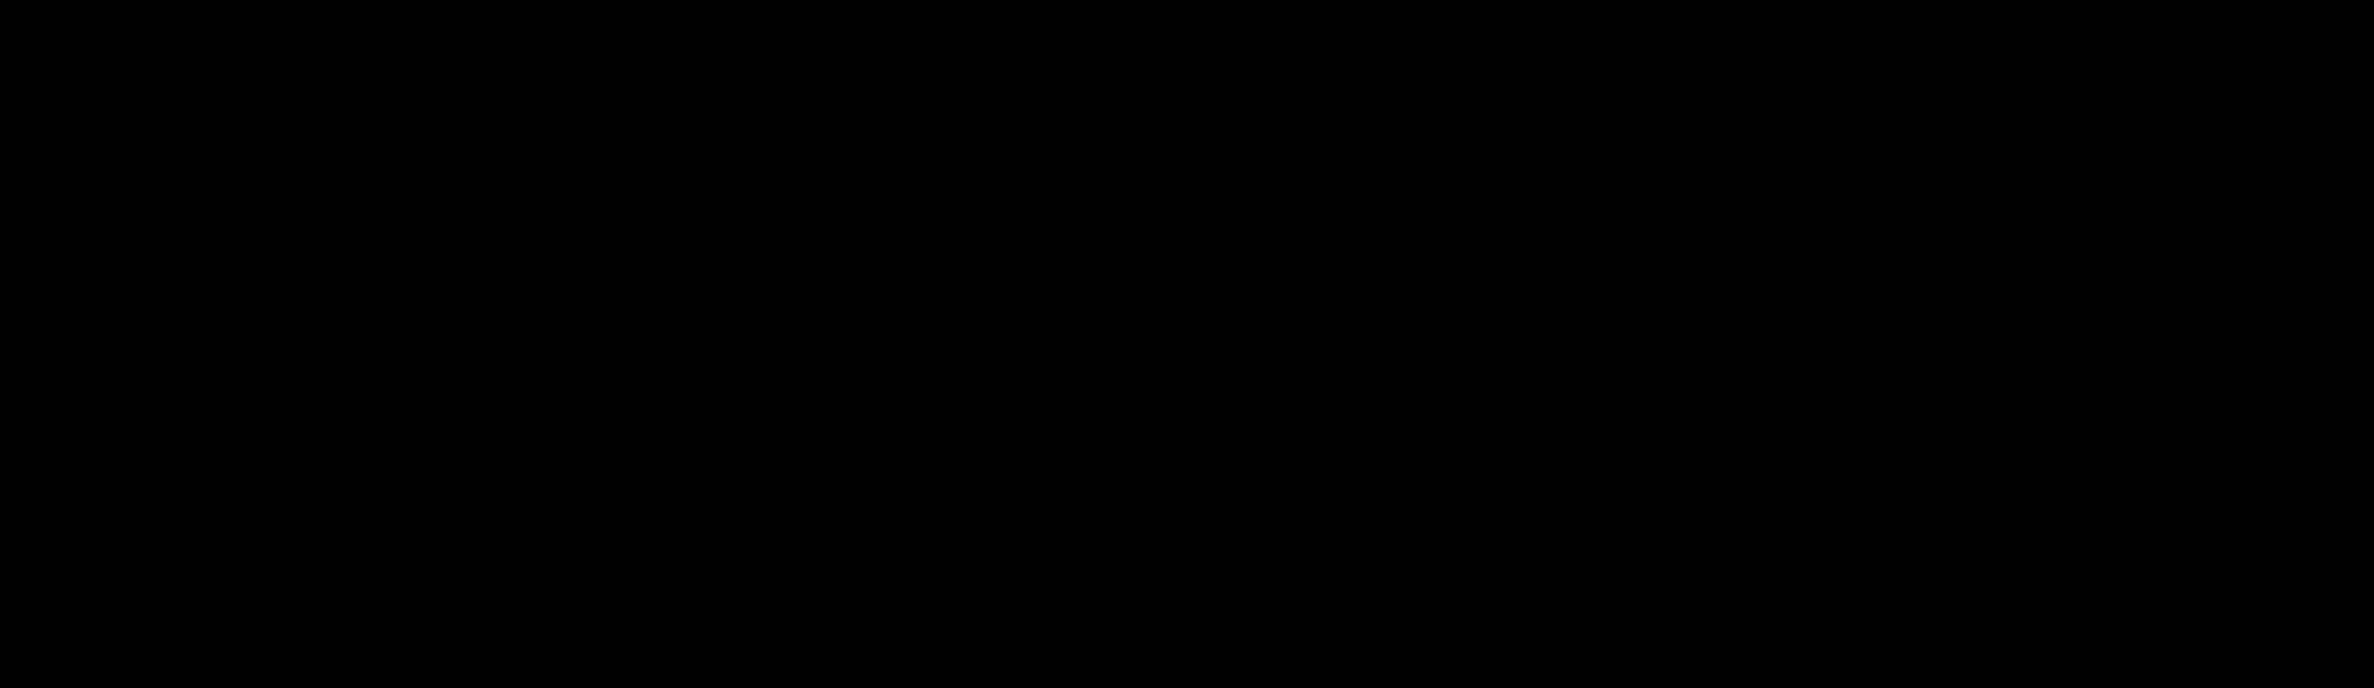 LittleBig Logo